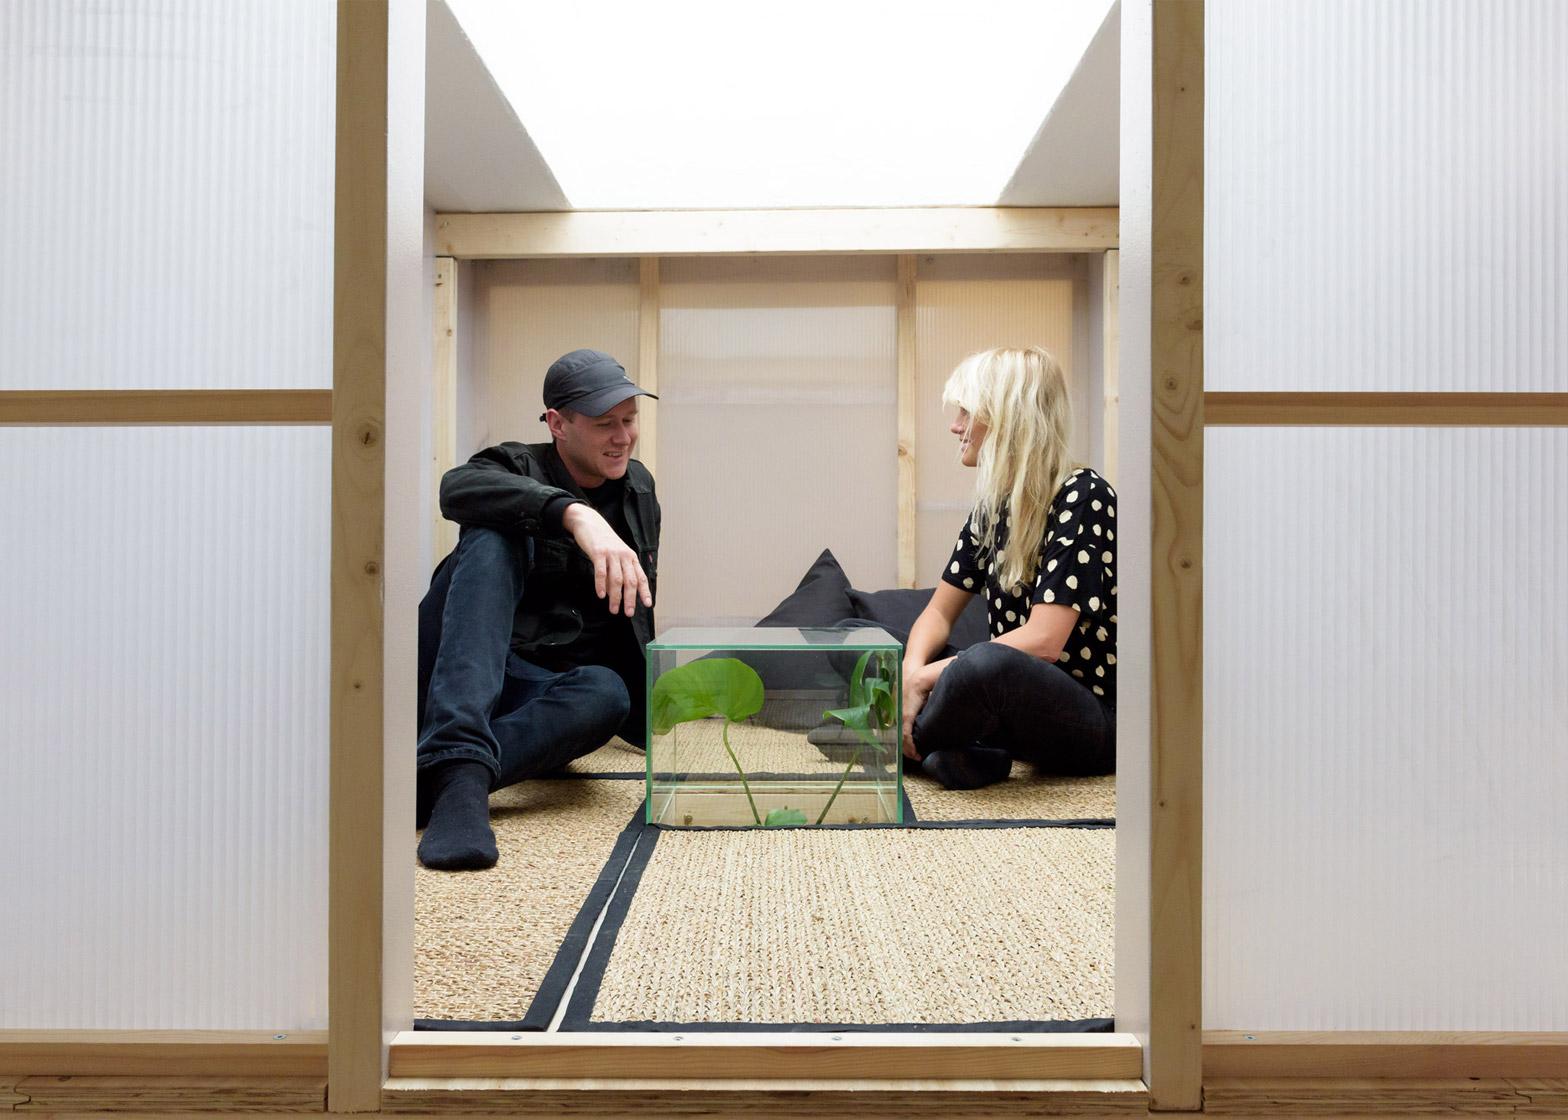 Ikea-Space-10-Innovation-Lab_Alastair-Philip-Wiper_dezeen_1568_12